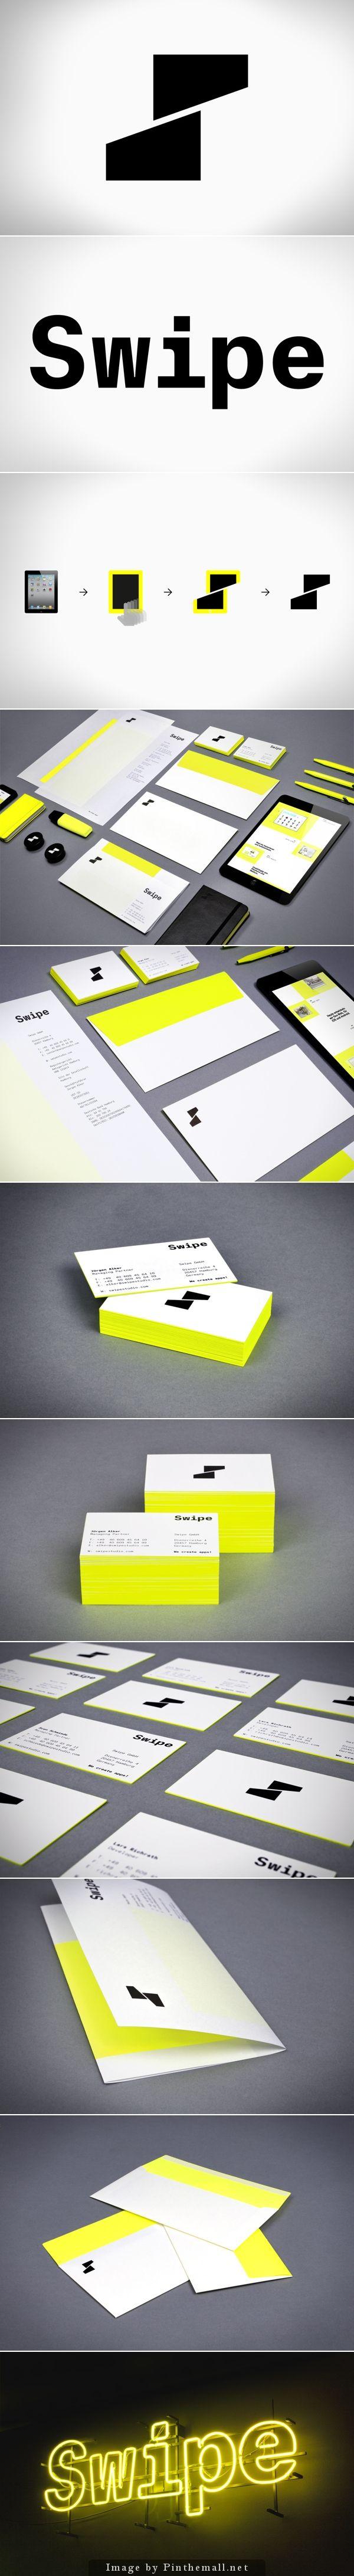 Swipe branding on Behance